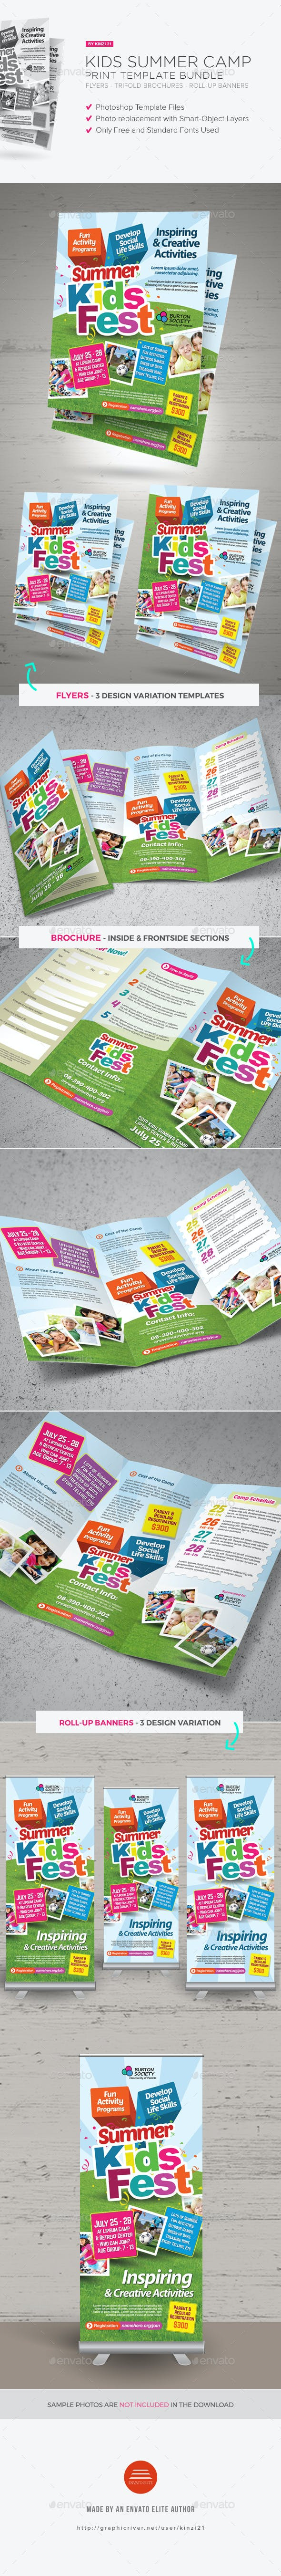 kids summer camp print bundle by kinzi21 graphicriver